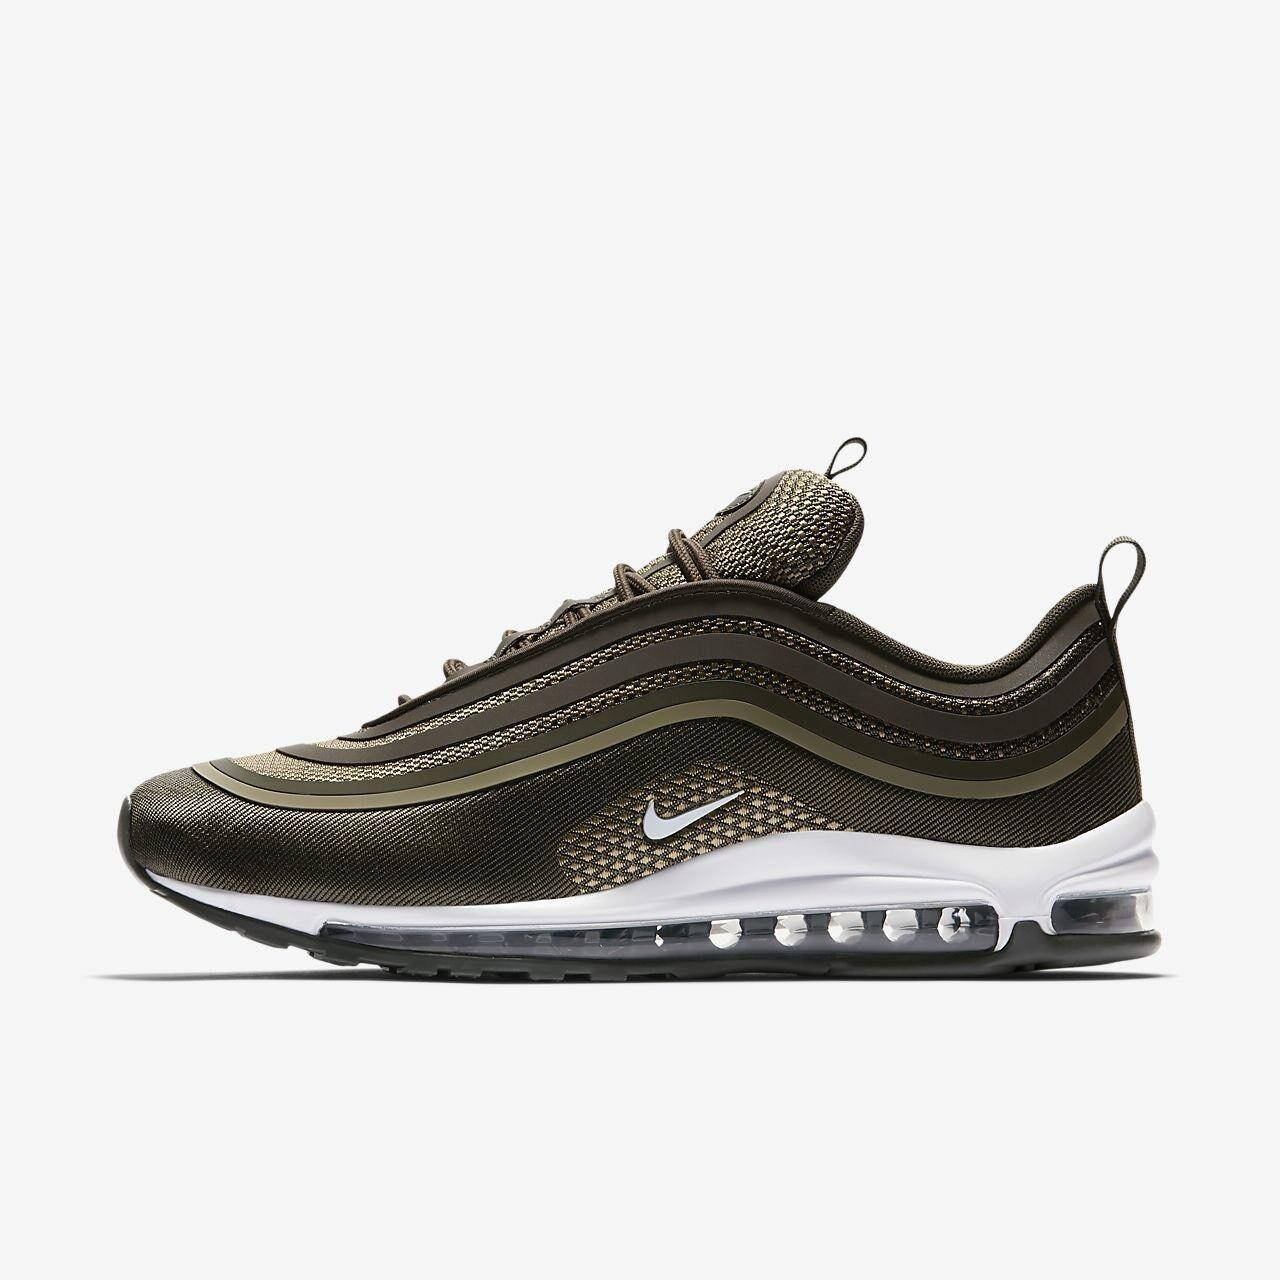 Nike air max 97 97 max ultra 17 fracht khaki 918356 301 10 og undftd skepta aus sw 1 98 399804